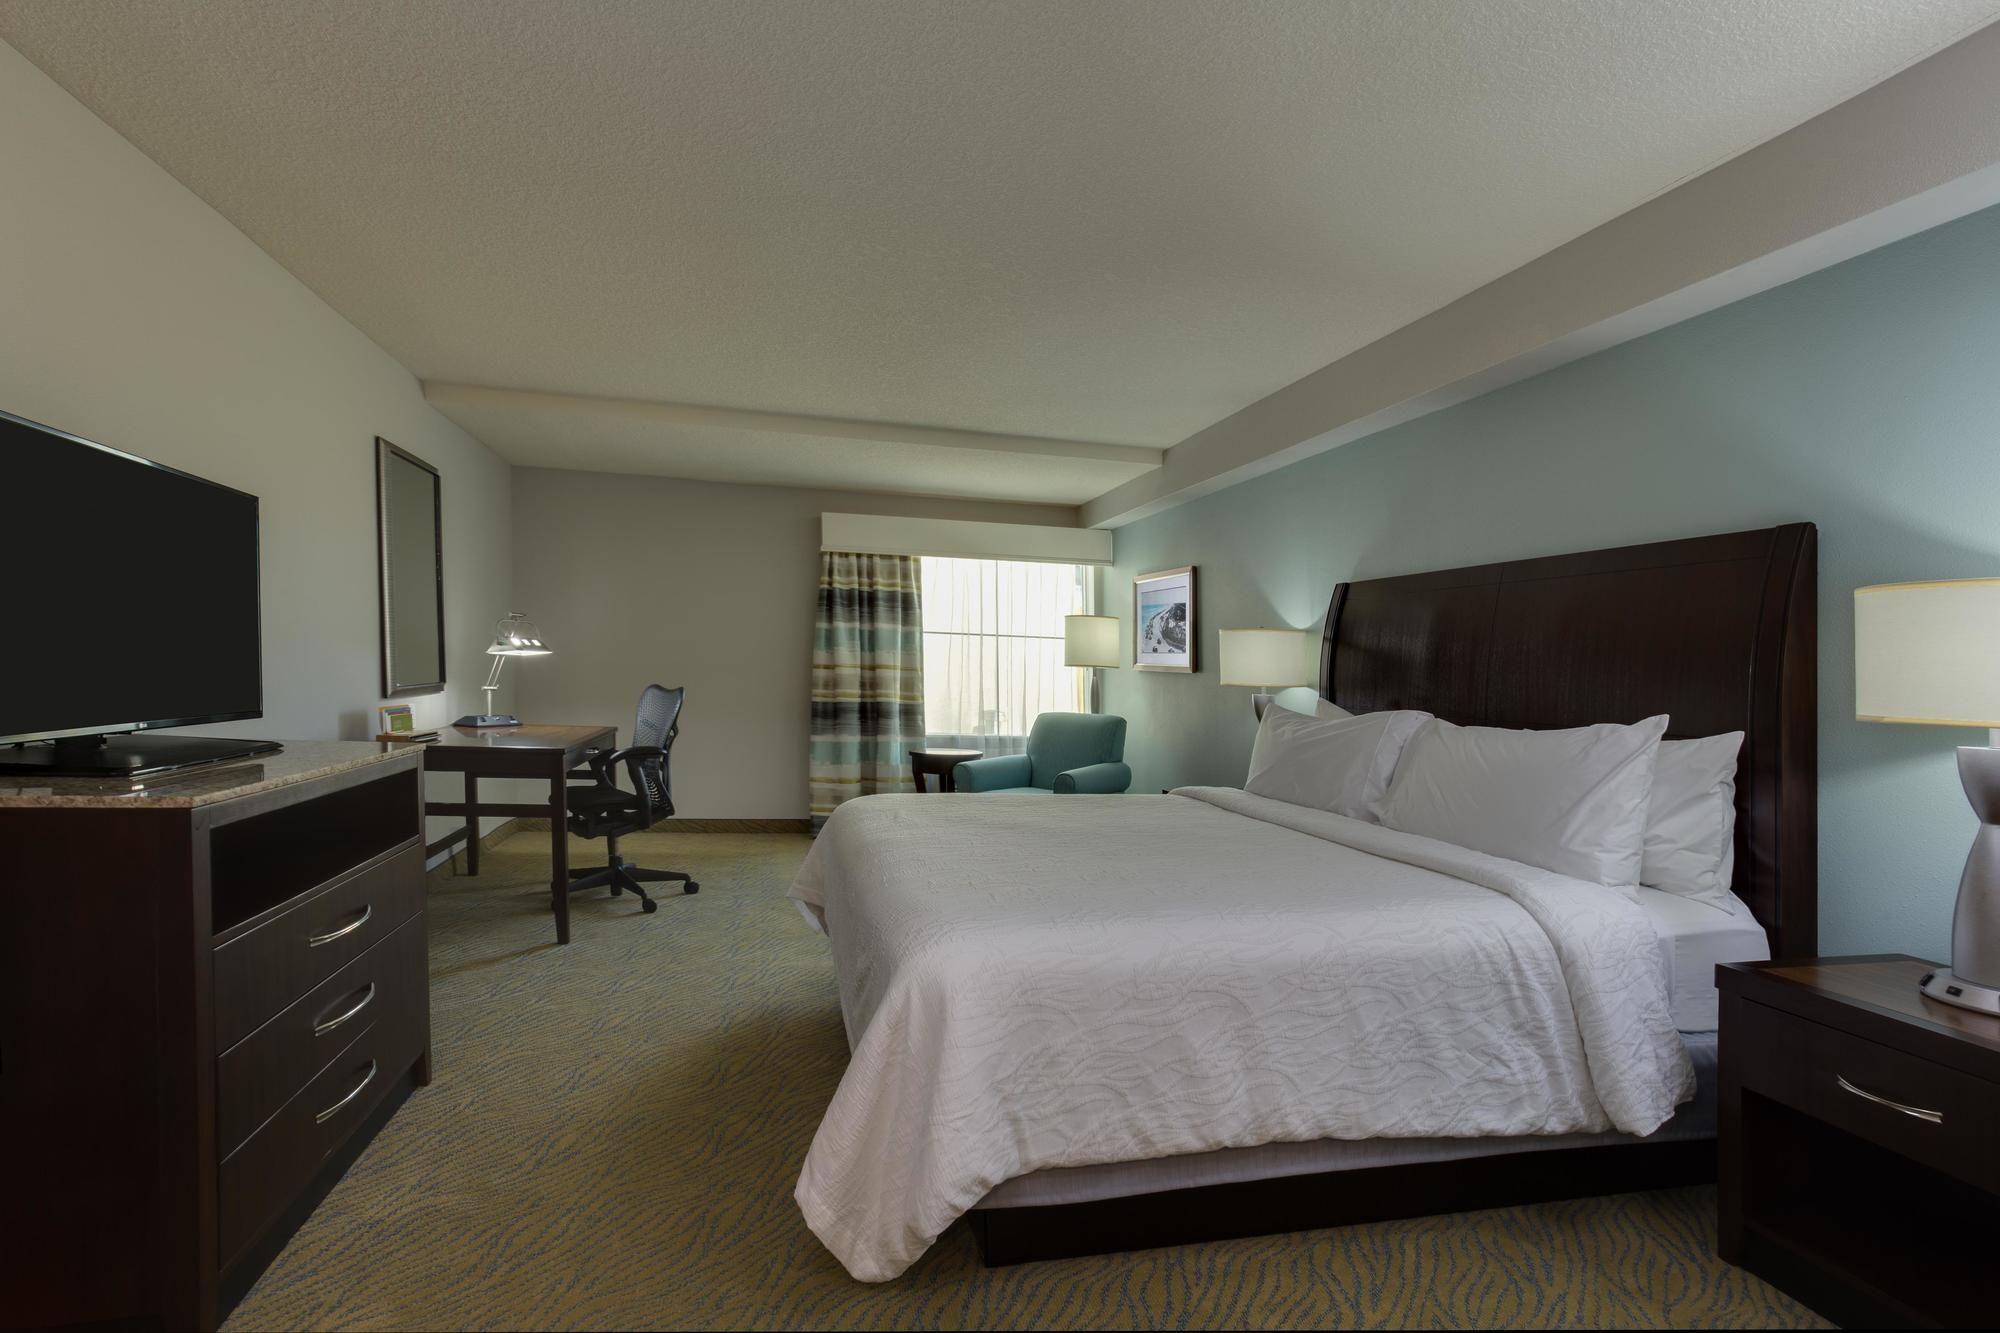 ... FL Hilton Garden Inn Daytona Beach Oceanfront In Holly Hill, ...